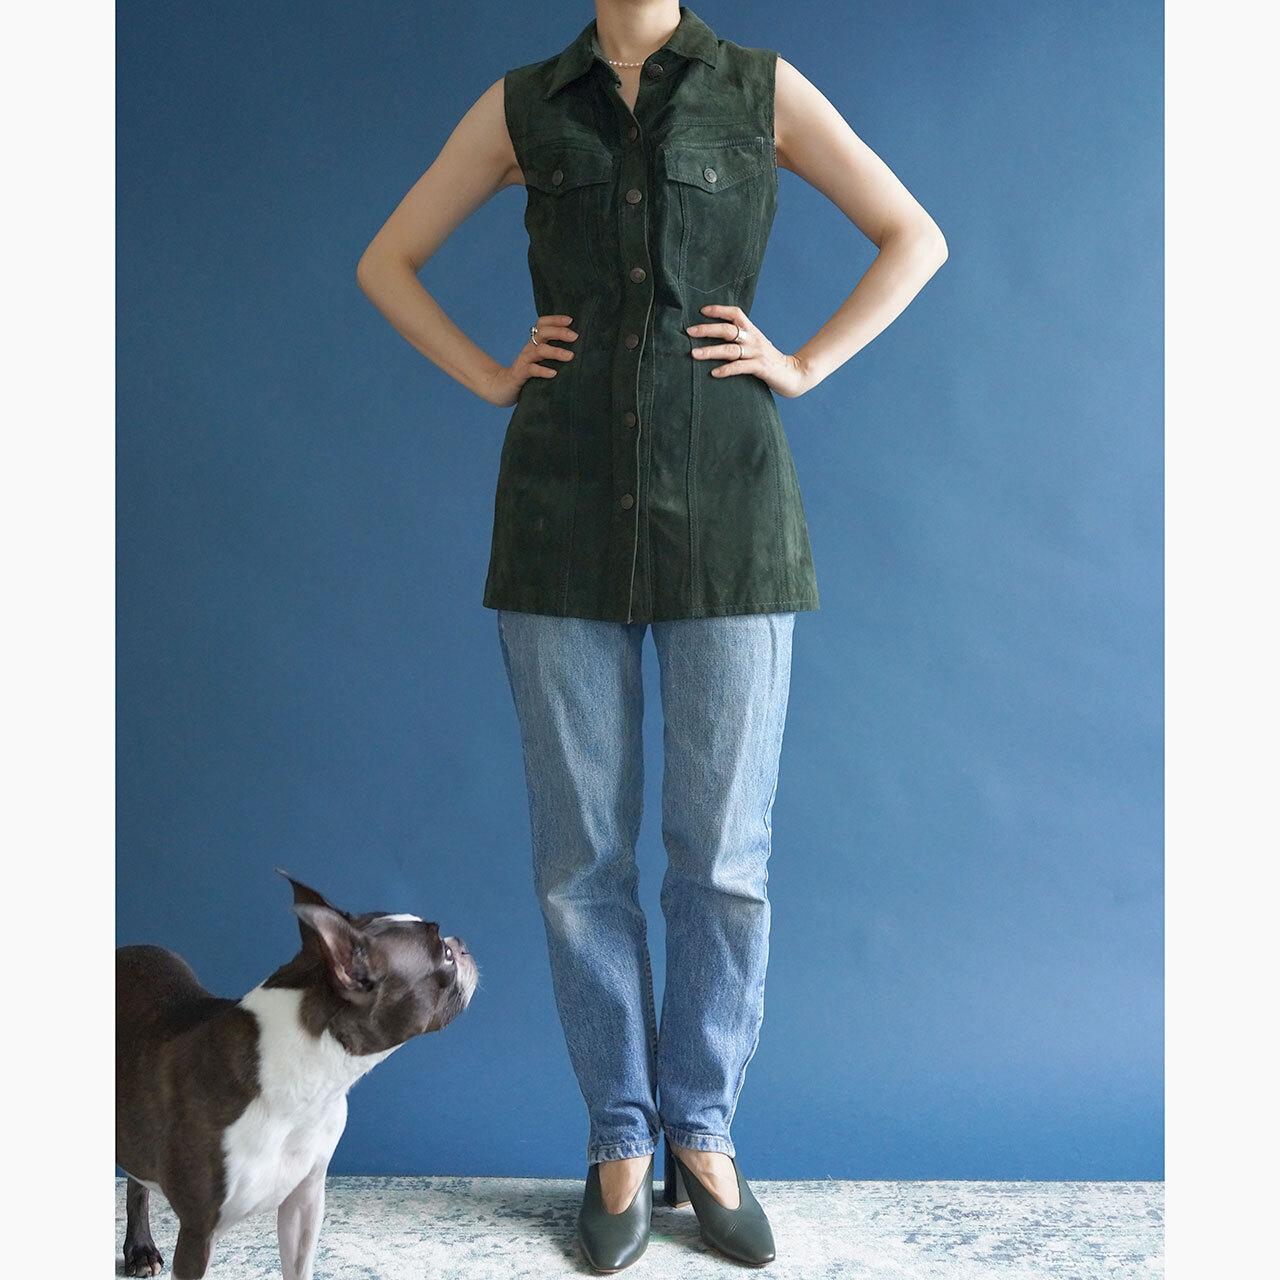 90's green suede long vest dress